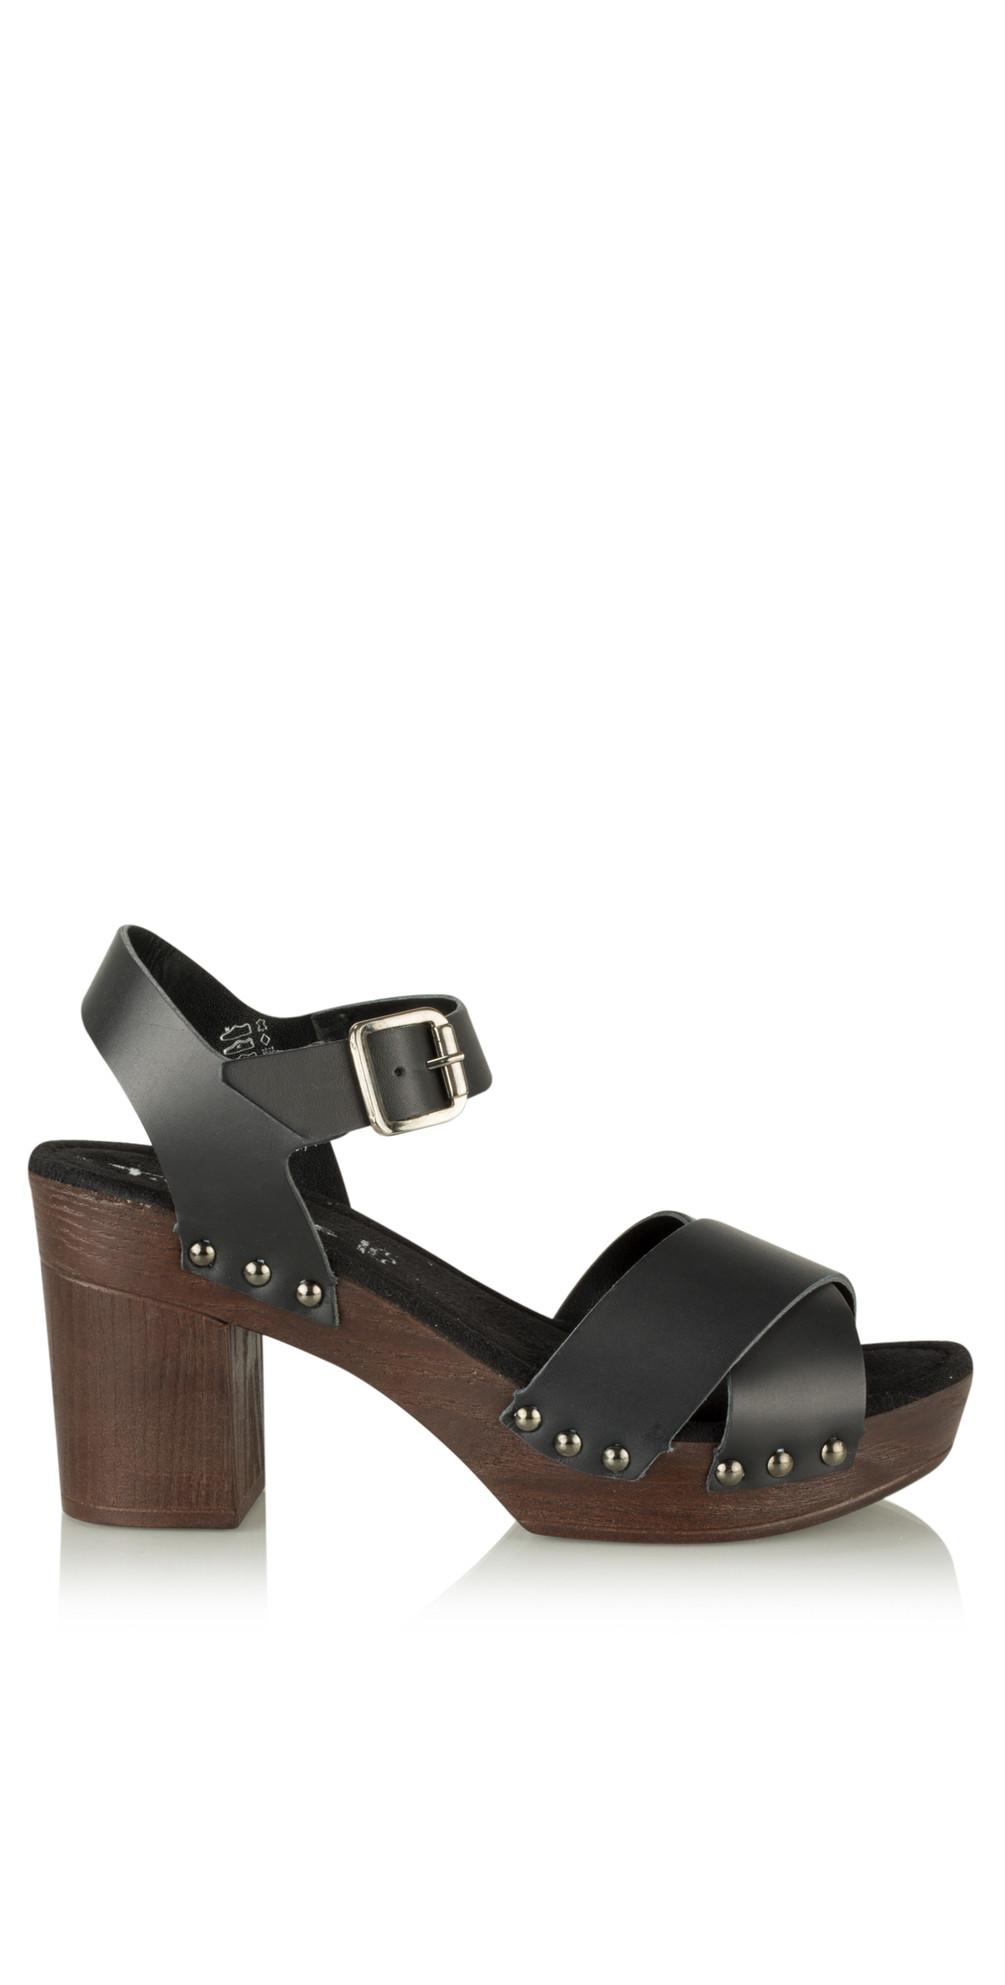 9653b88d84b Tamaris Leather Clog Sandal in Black